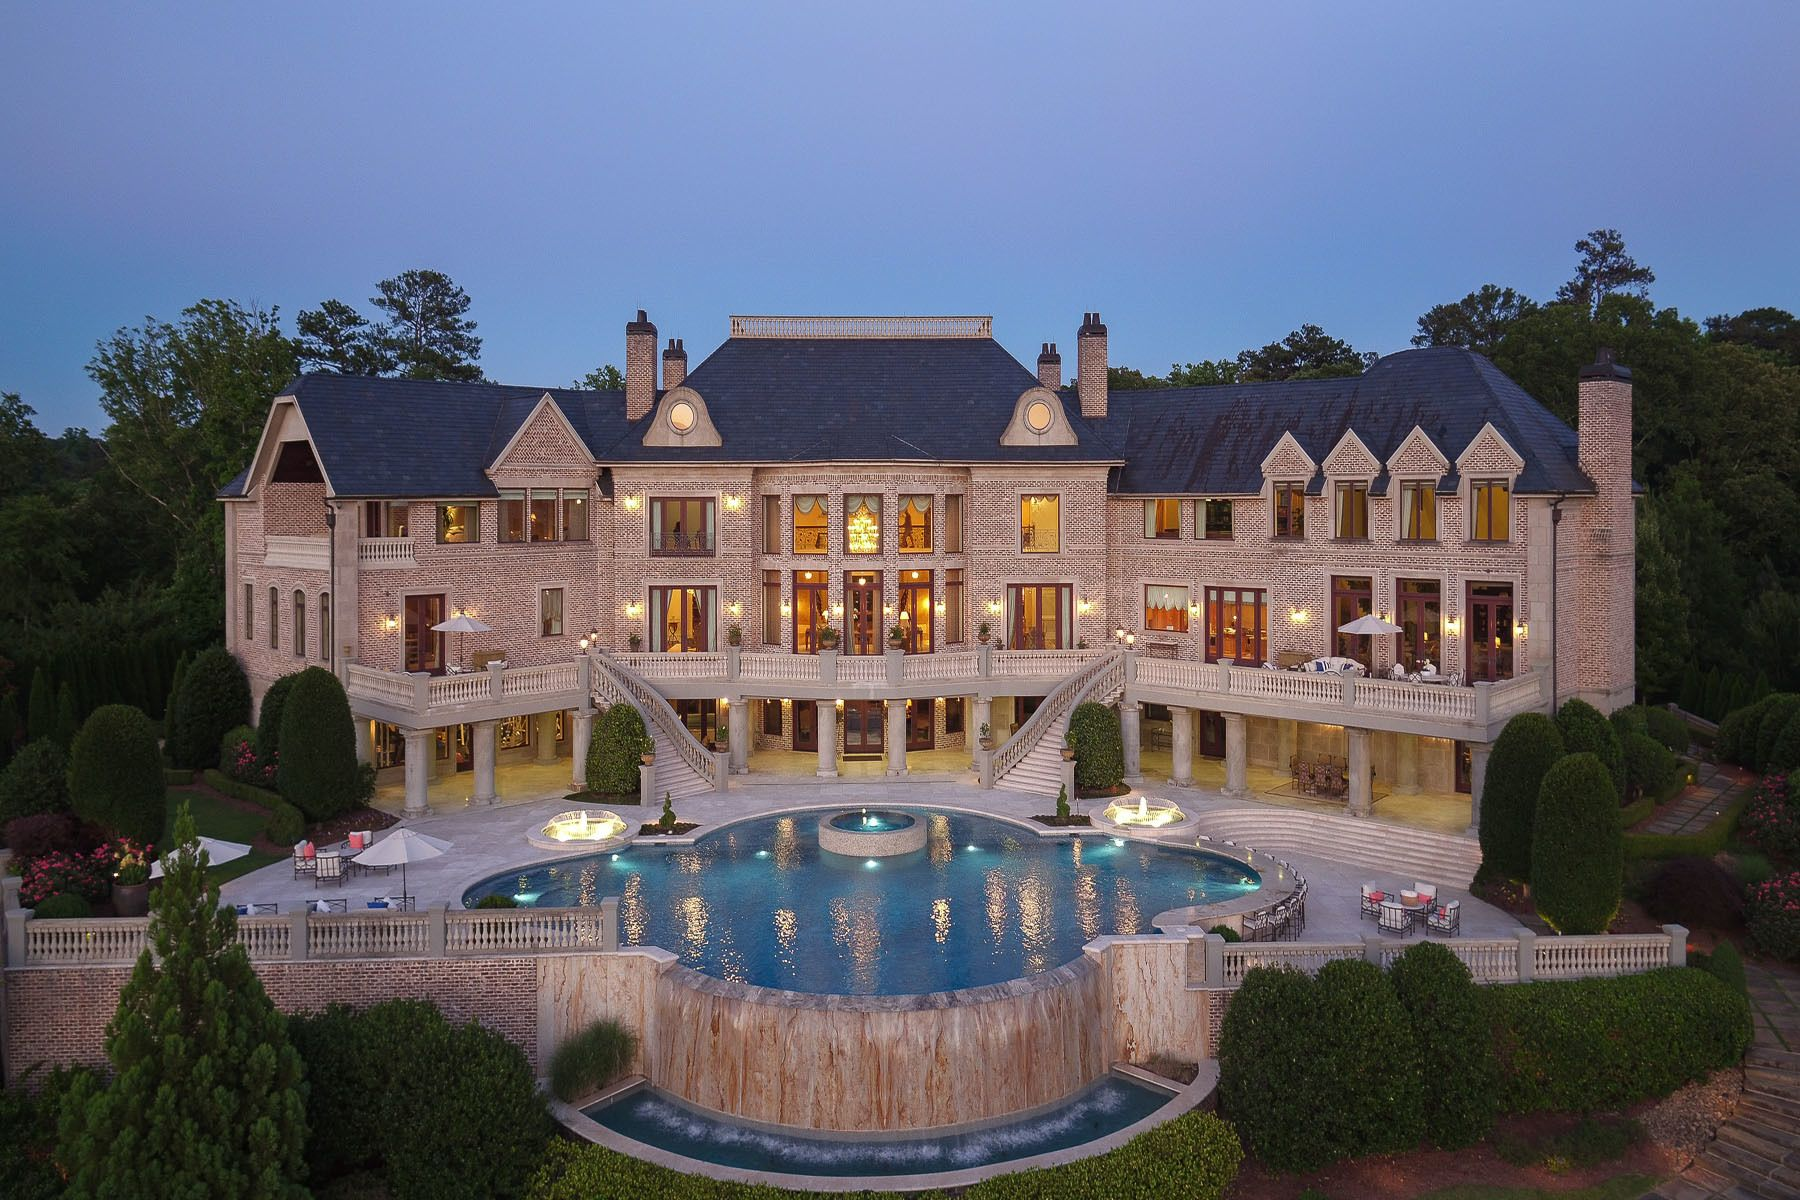 Get Details Of Atlanta S Most Spectacular Gated Estate Nestled On 17 Parklike Acres In Atlanta Ga United Atlanta Mansions Mansions Luxury Homes Dream Houses